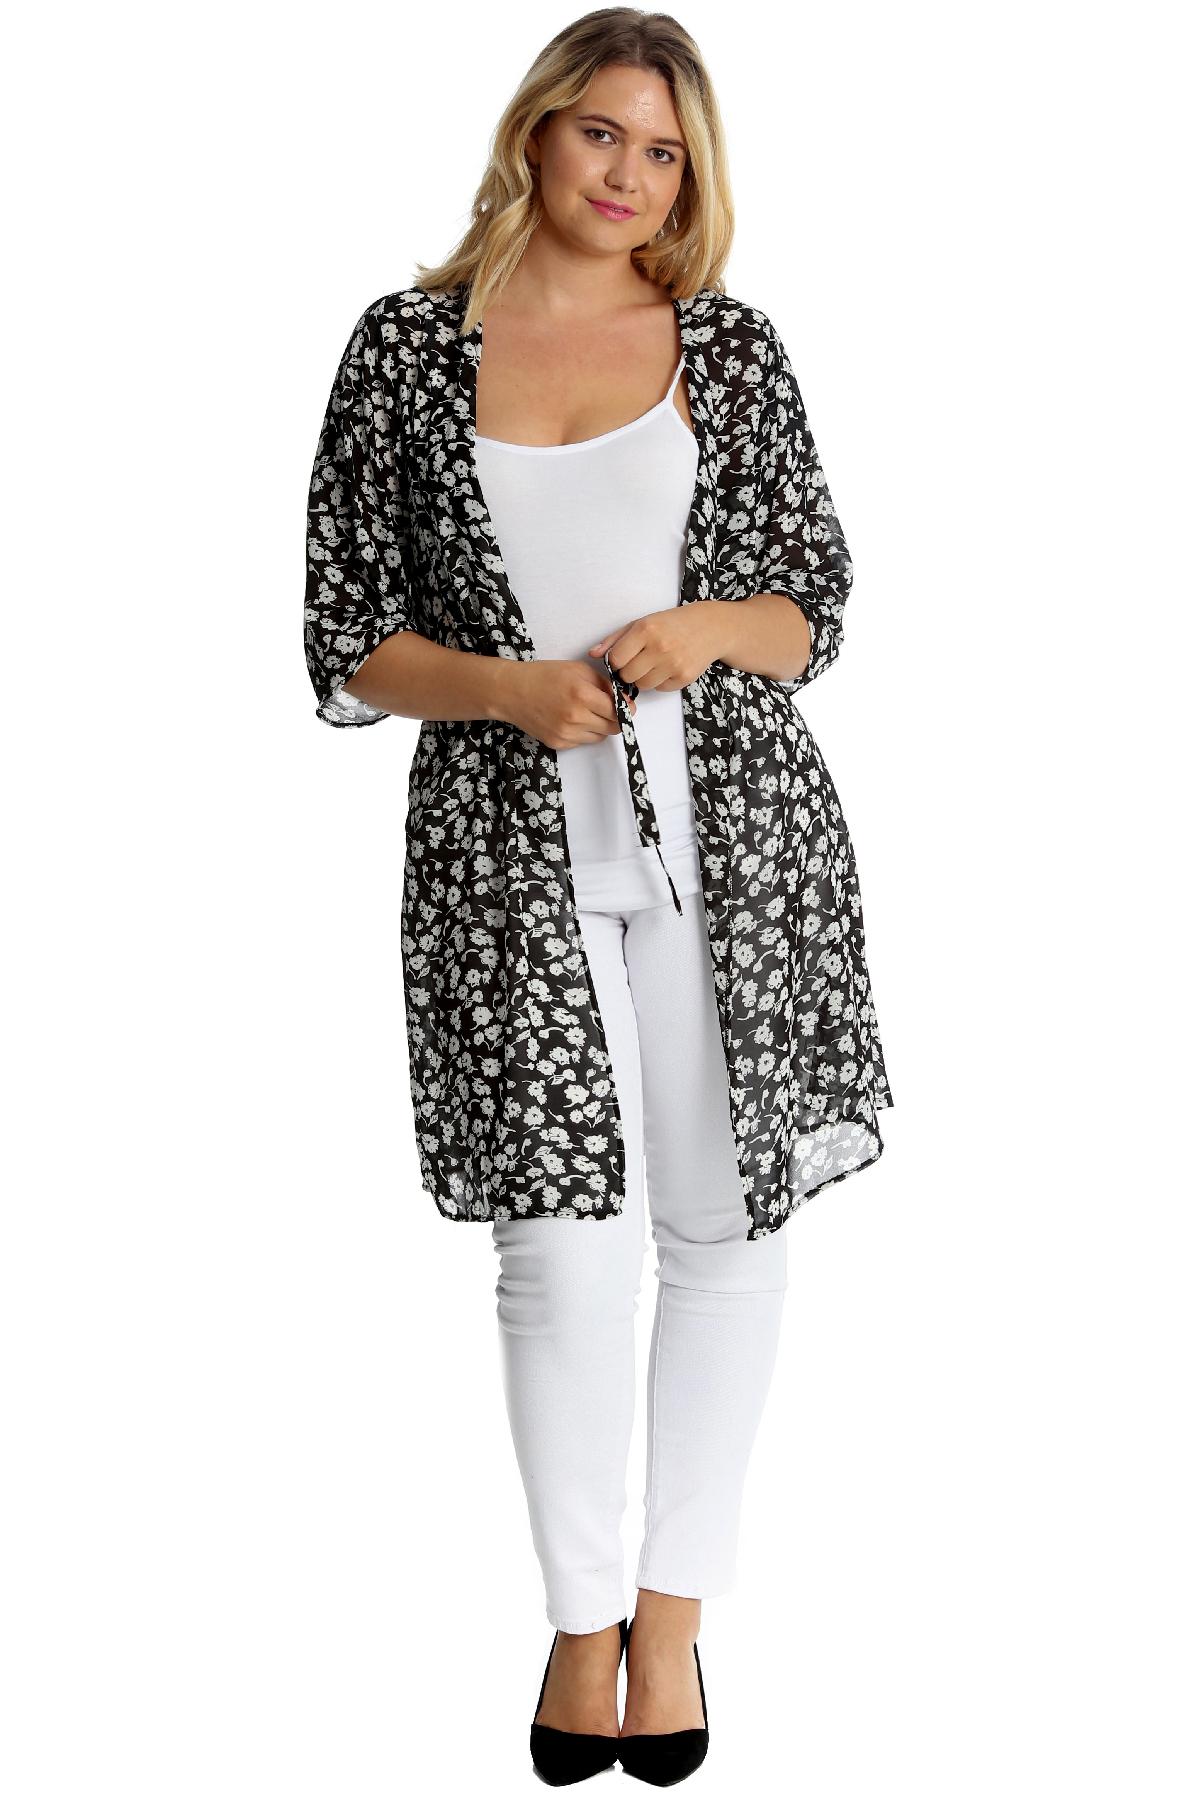 New Womens Plus Size Cardigan Ladies Floral Print Chiffon Front Tie Cardigan